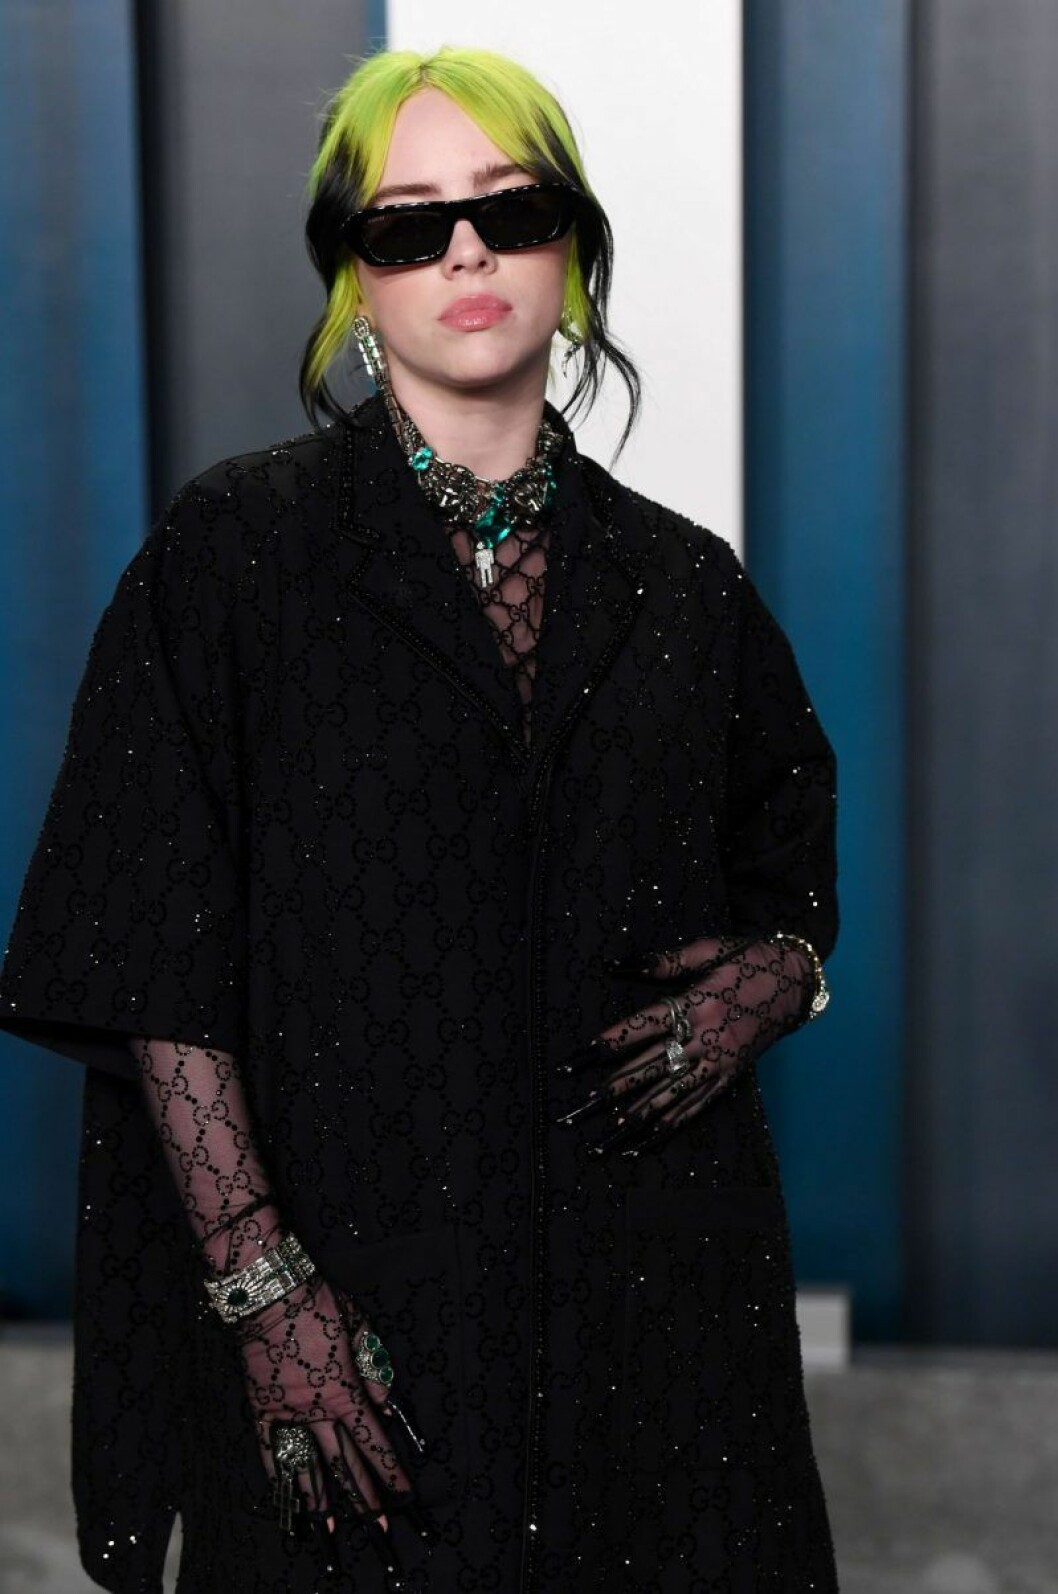 Billie Eilish i solglasögon